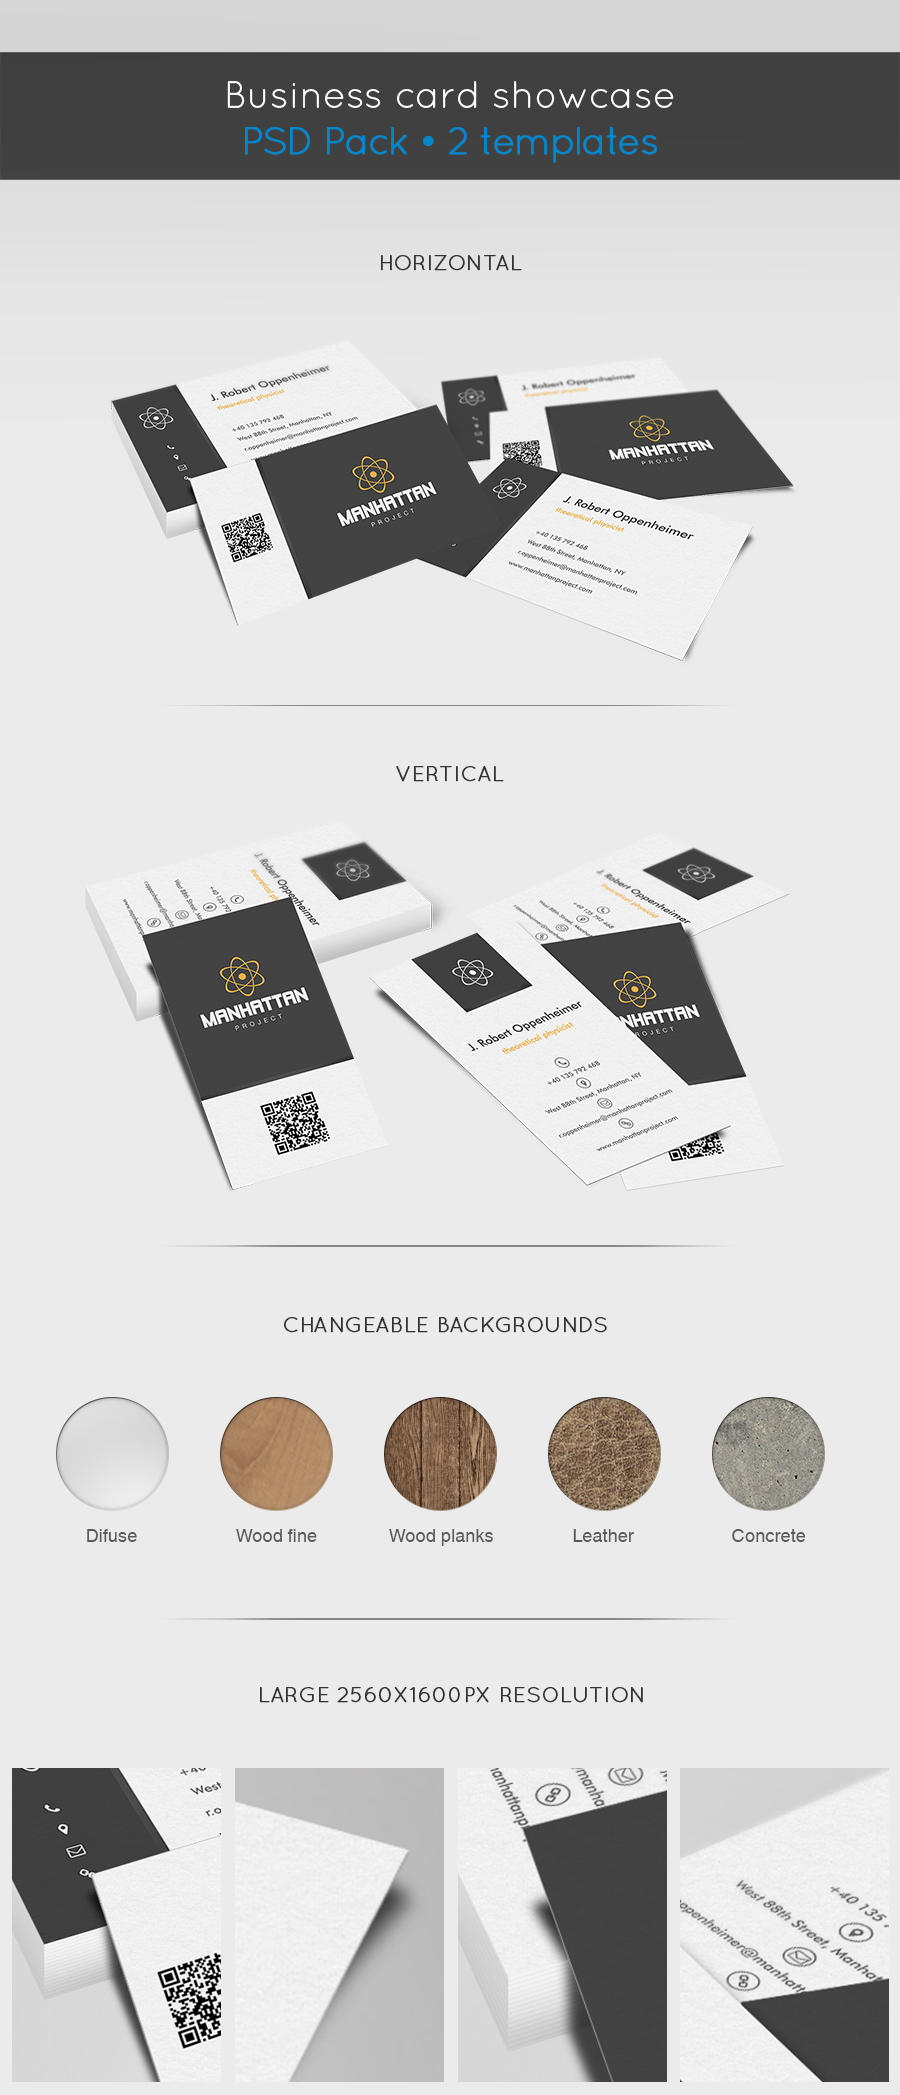 Business card showcase template by raduluchian